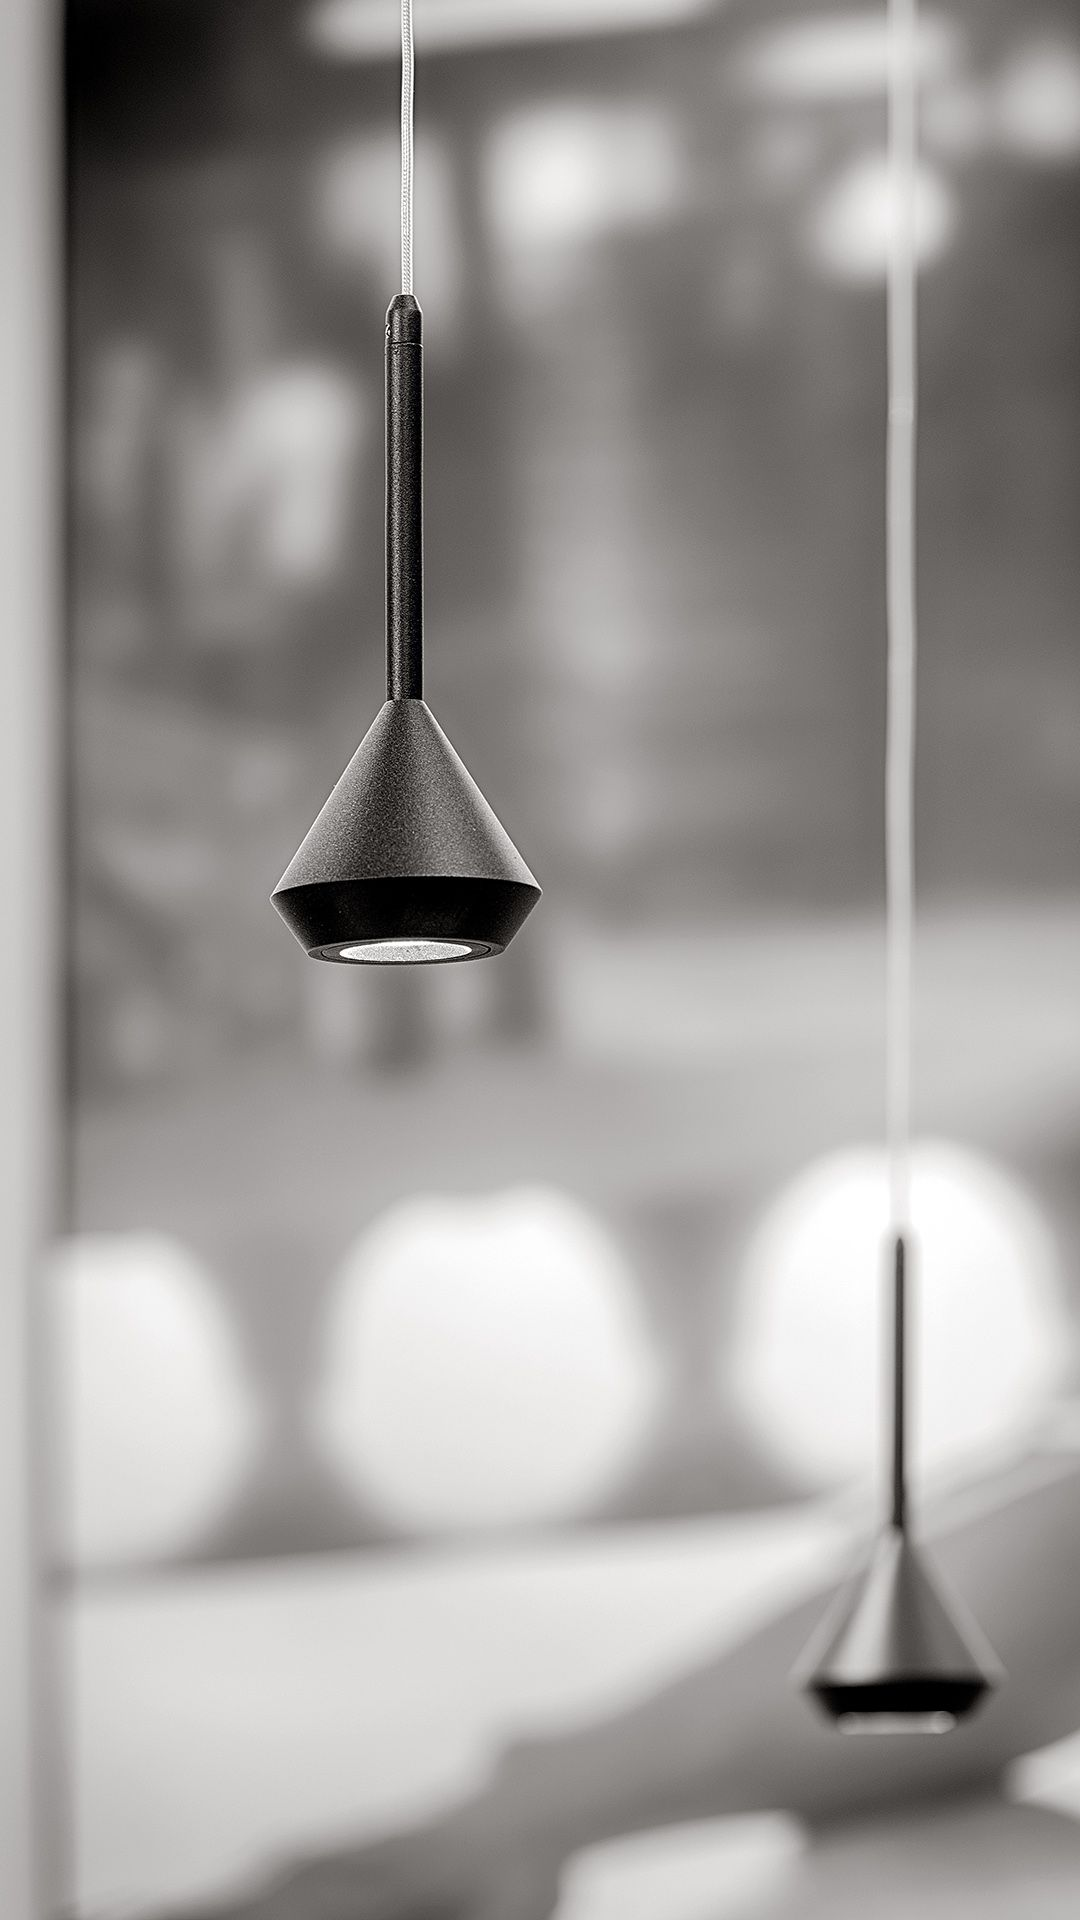 Bulthaup Showroom In 2020 Lighting Showroom Light Of Life Ceiling Lights